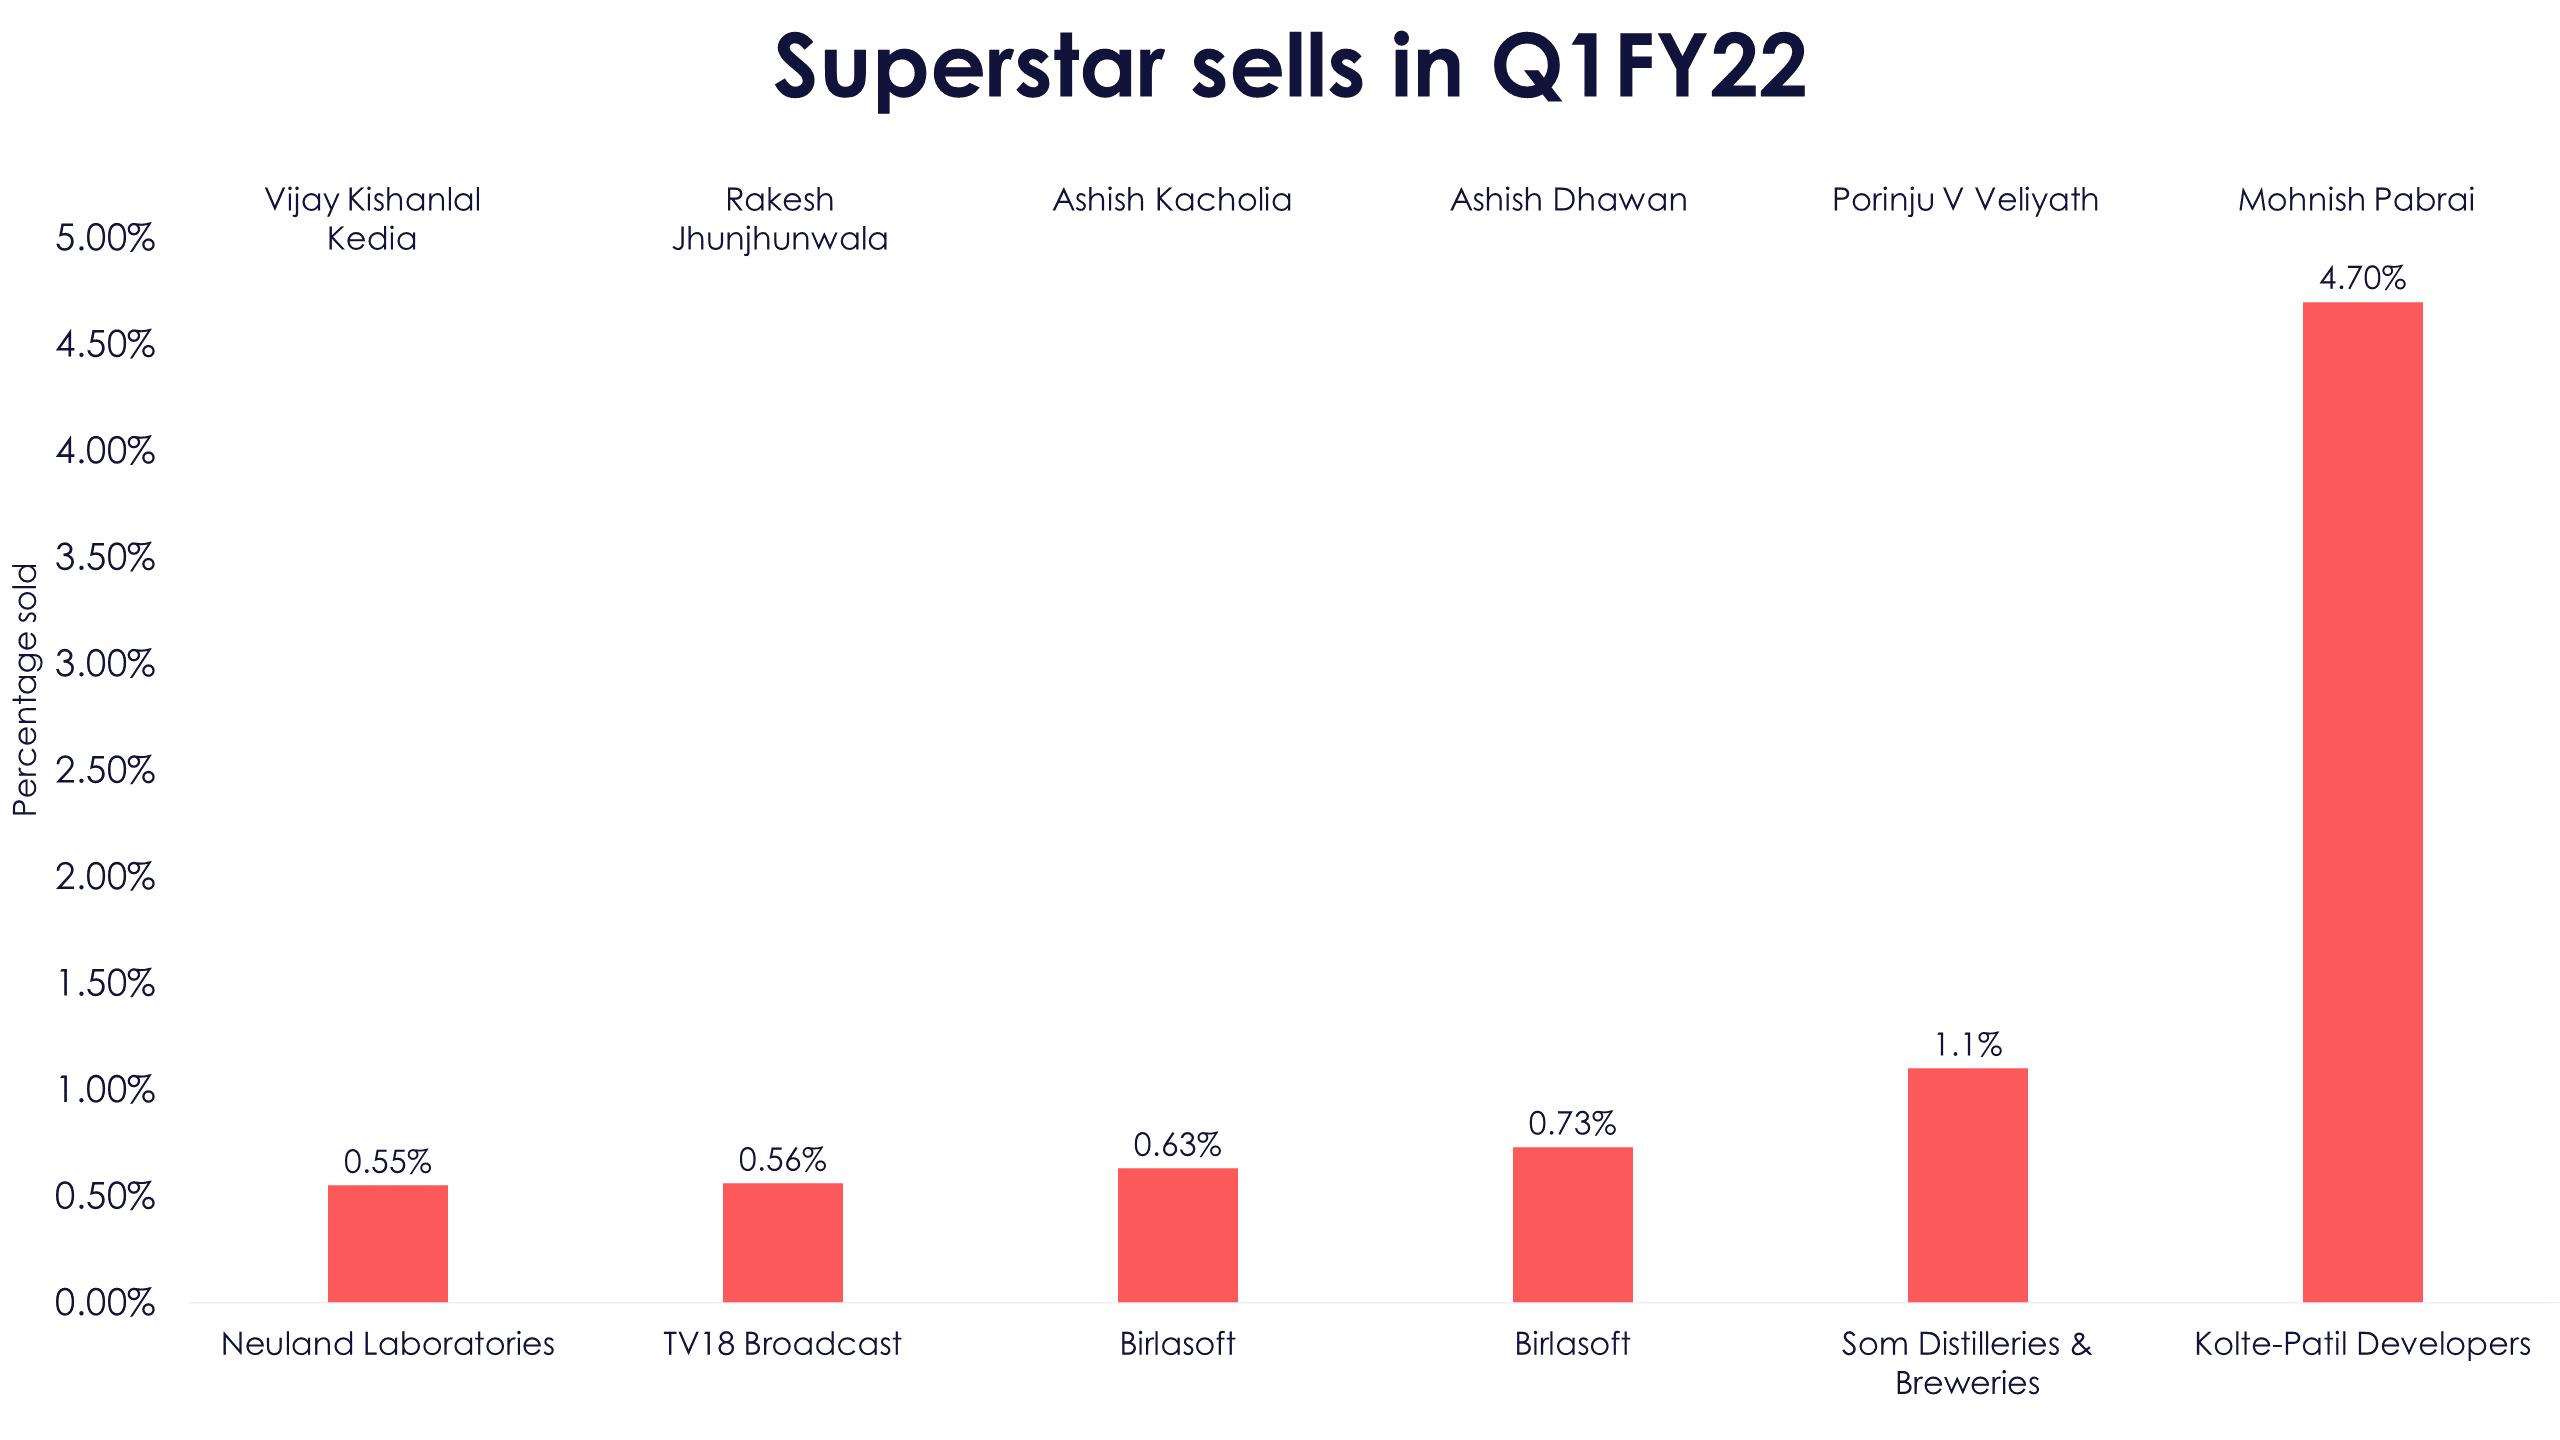 Superstar Sells